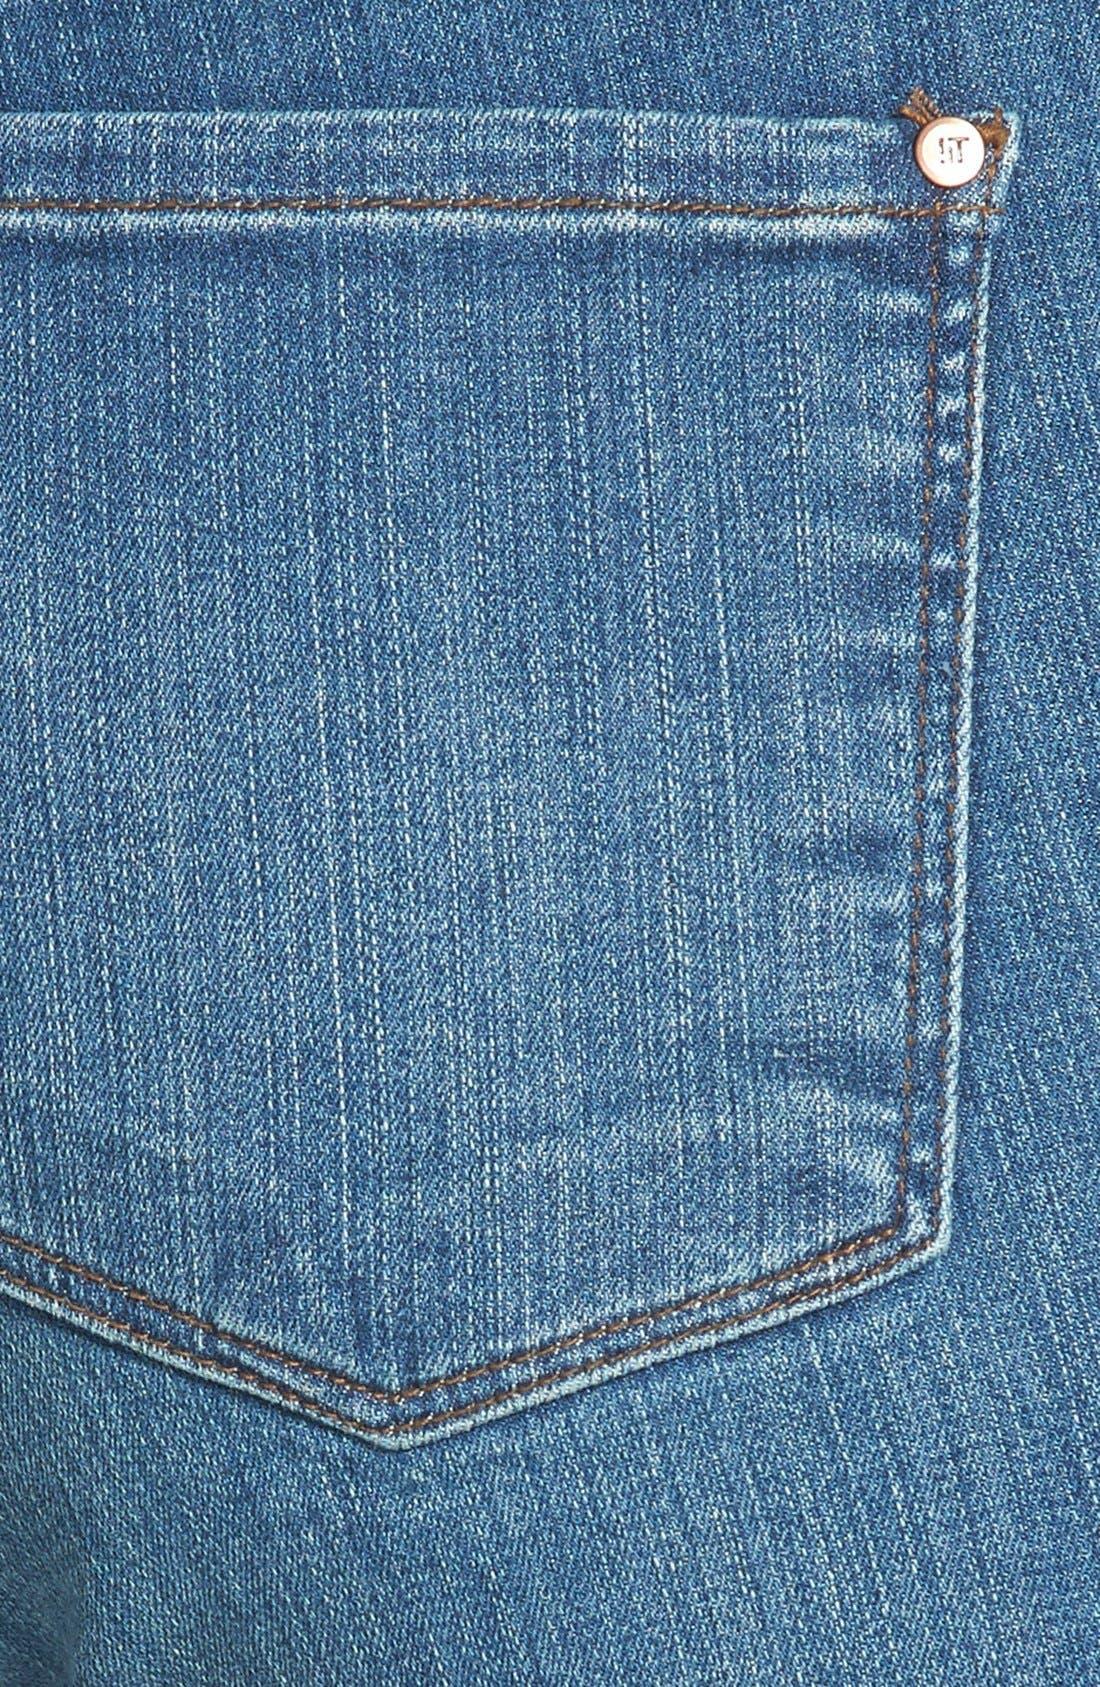 Alternate Image 3  - !iT Collective 'Lauren' Stretch Skinny Jeans (Solstice)